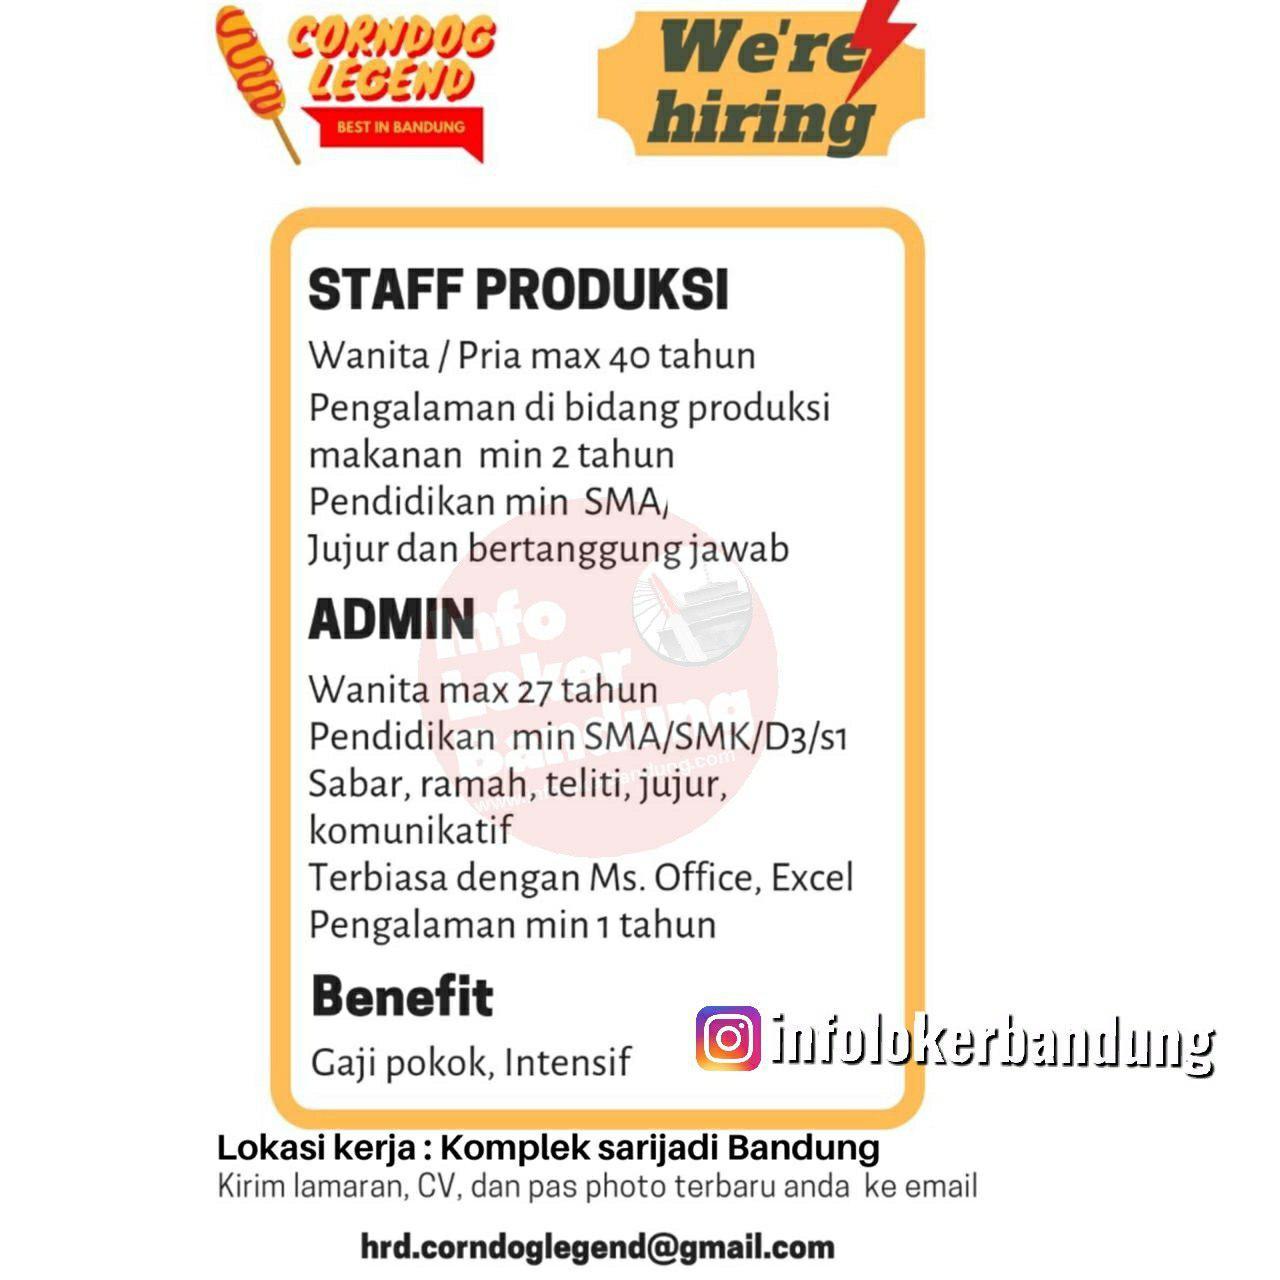 Lowongan Kerja Corndog Legend Bandung November 2019